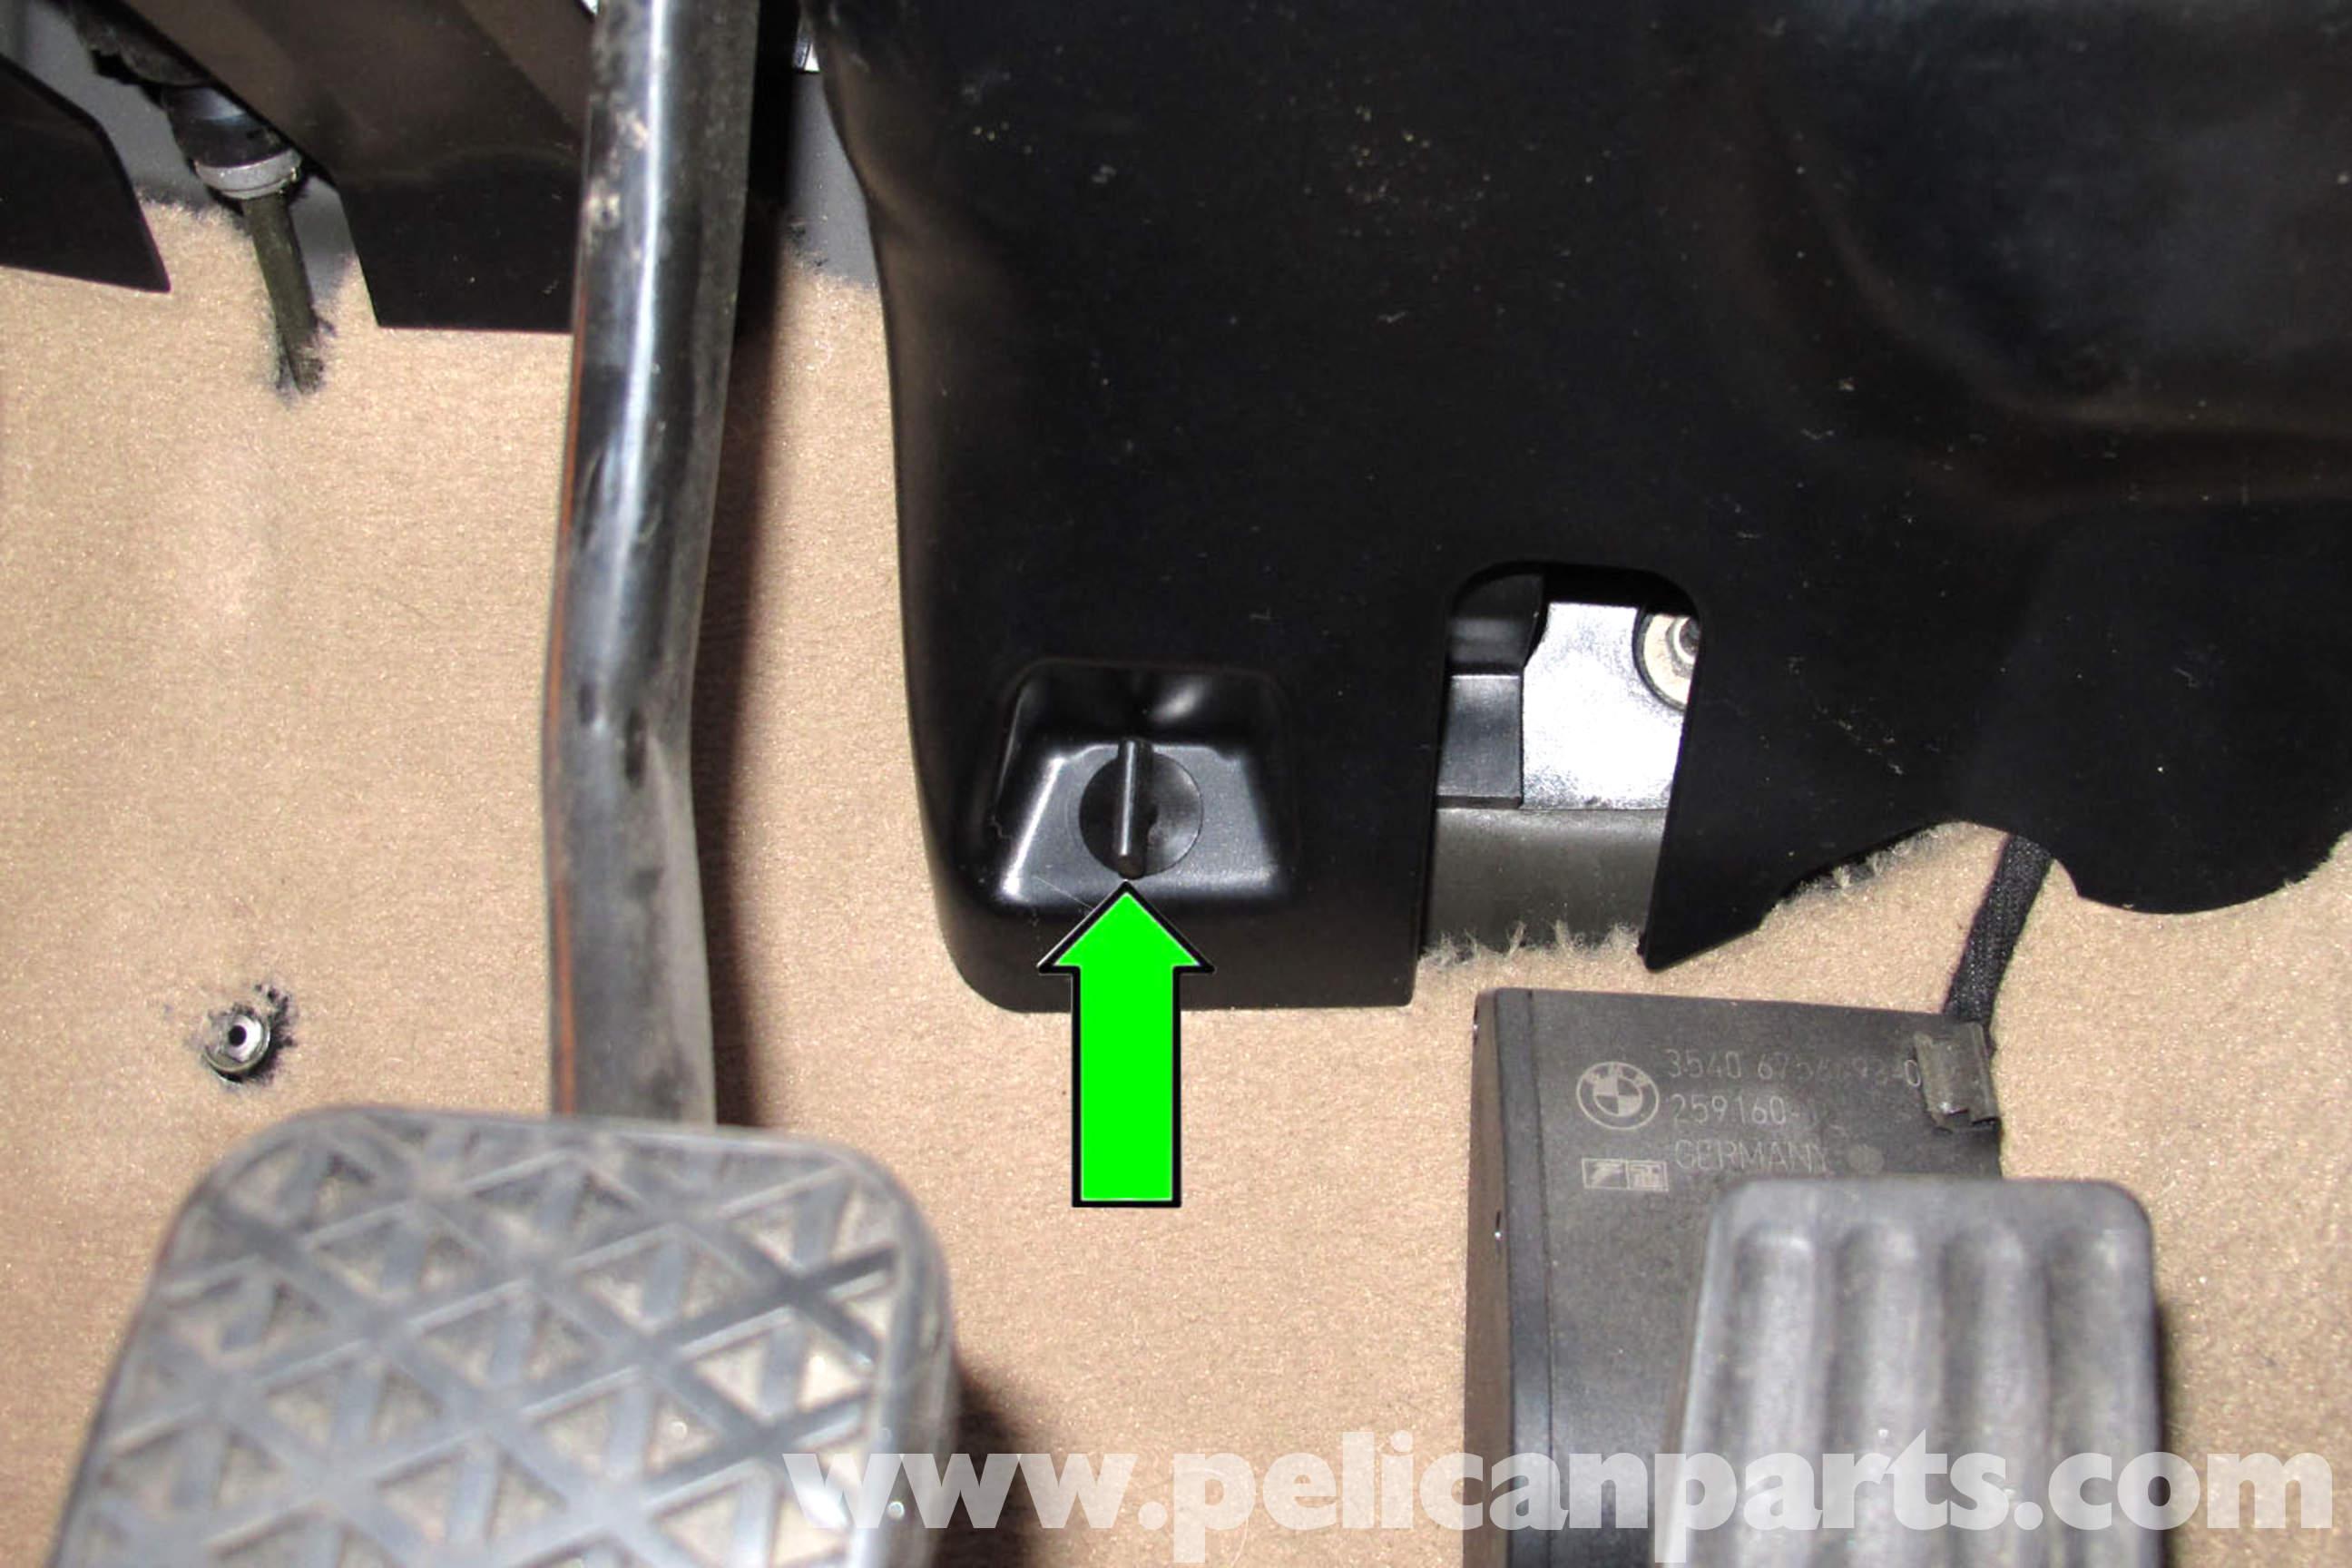 pic03 bmw e46 clutch pedal bushing replacement bmw 325i (2001 2005 bmw e46 clutch switch wiring diagram at bayanpartner.co